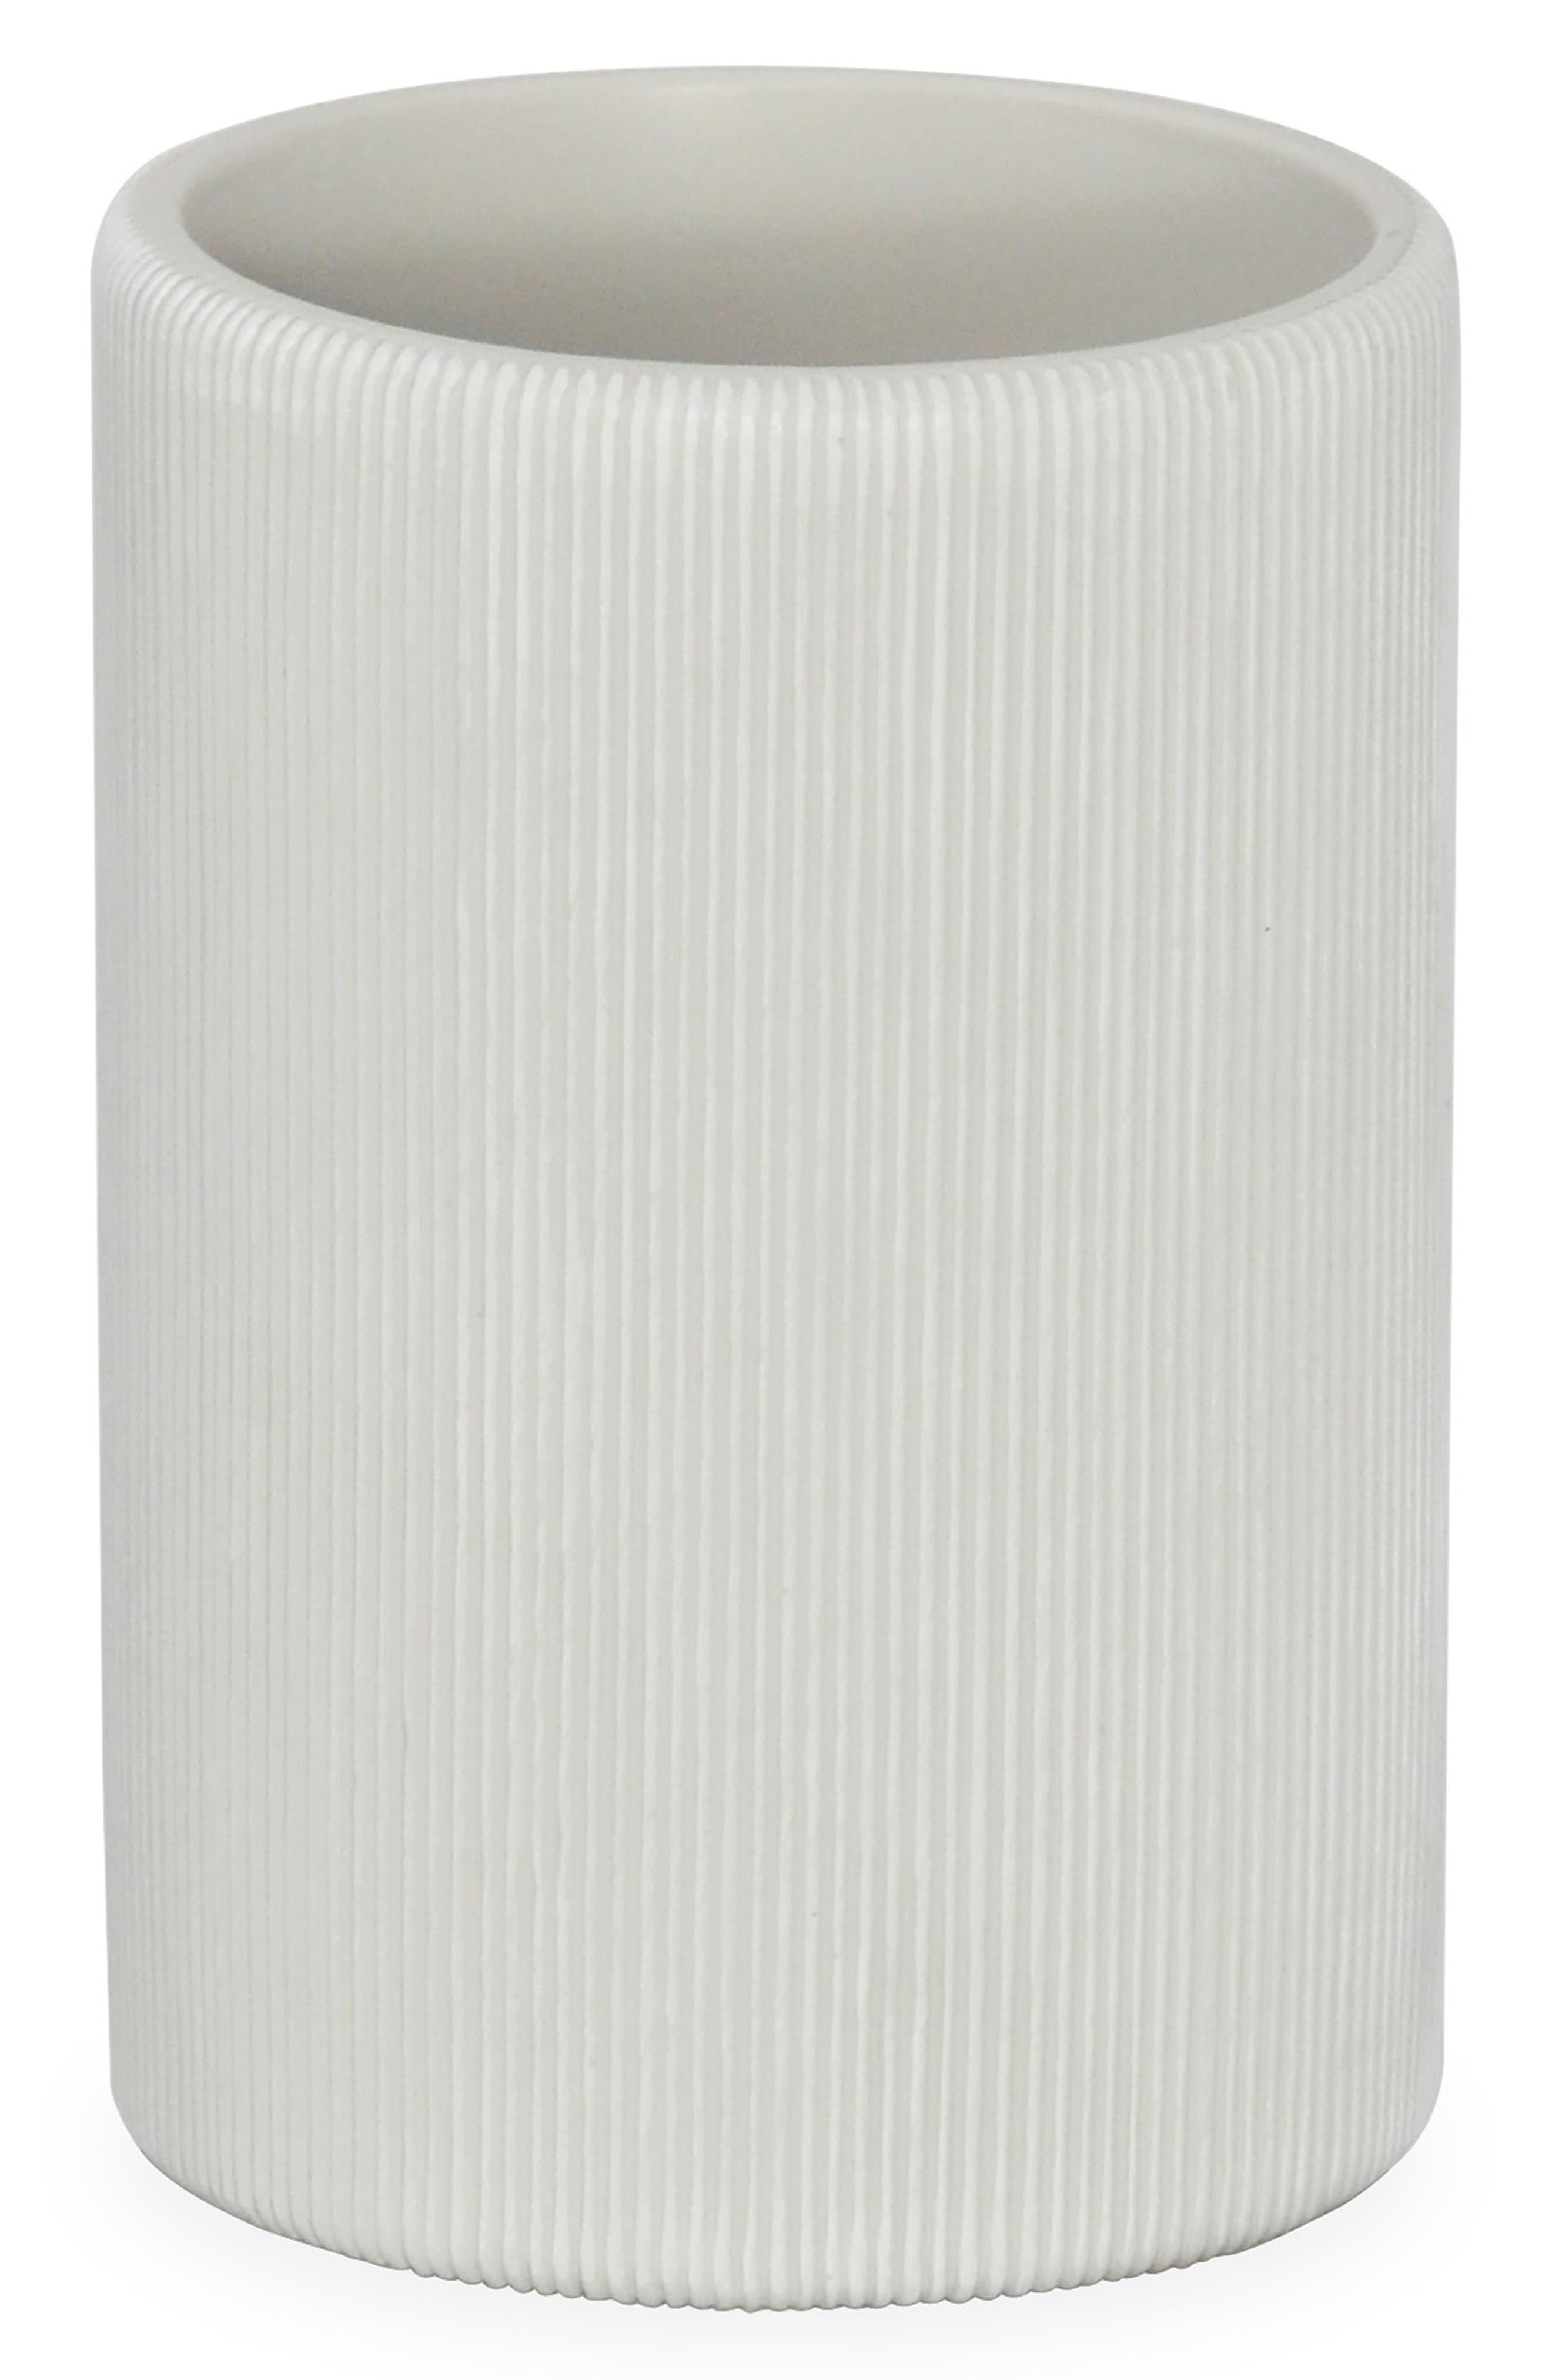 Fine Lines Ceramic Tumbler,                             Main thumbnail 1, color,                             100